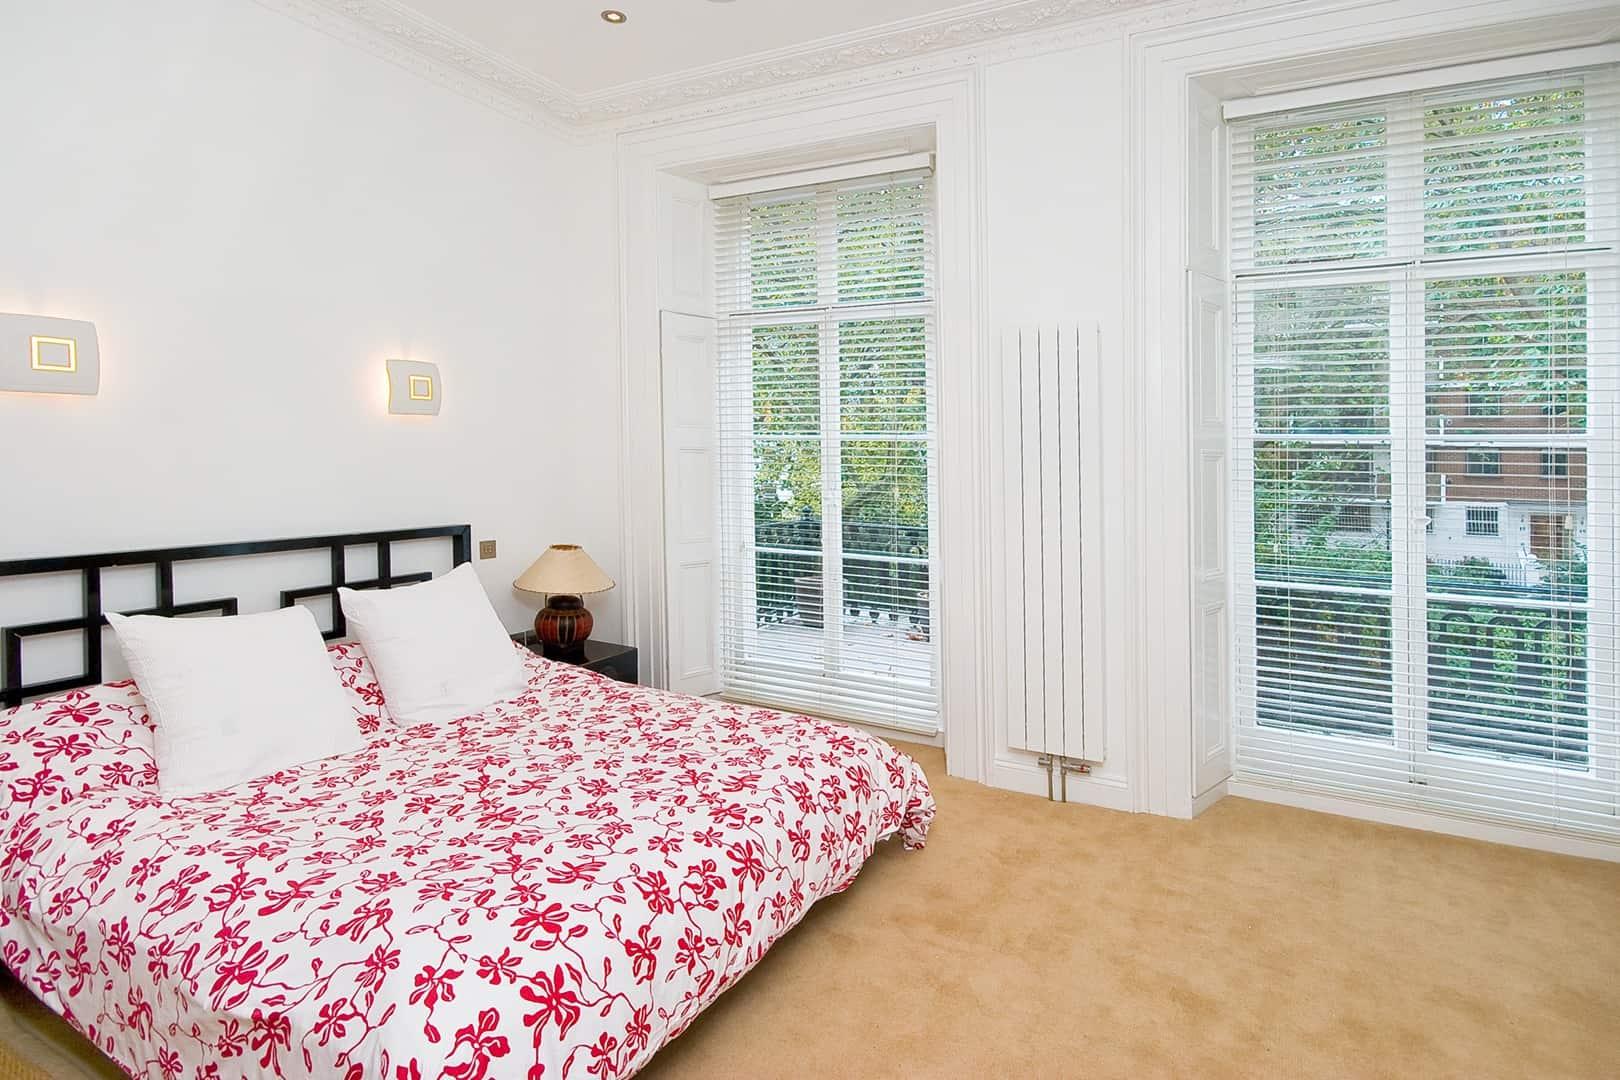 Bedroom - peacful